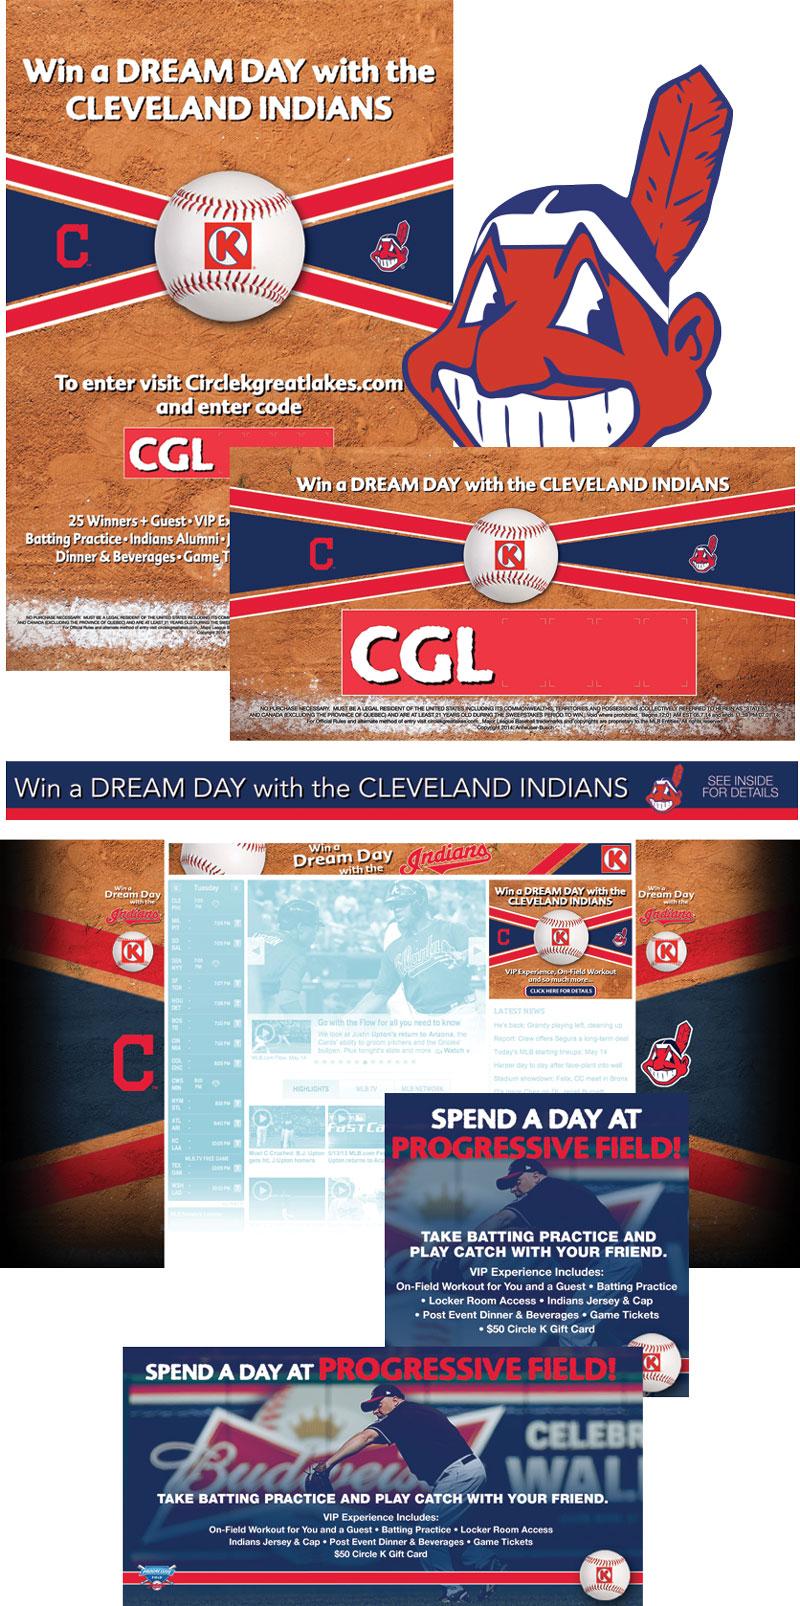 Circle K Cleveland Indians